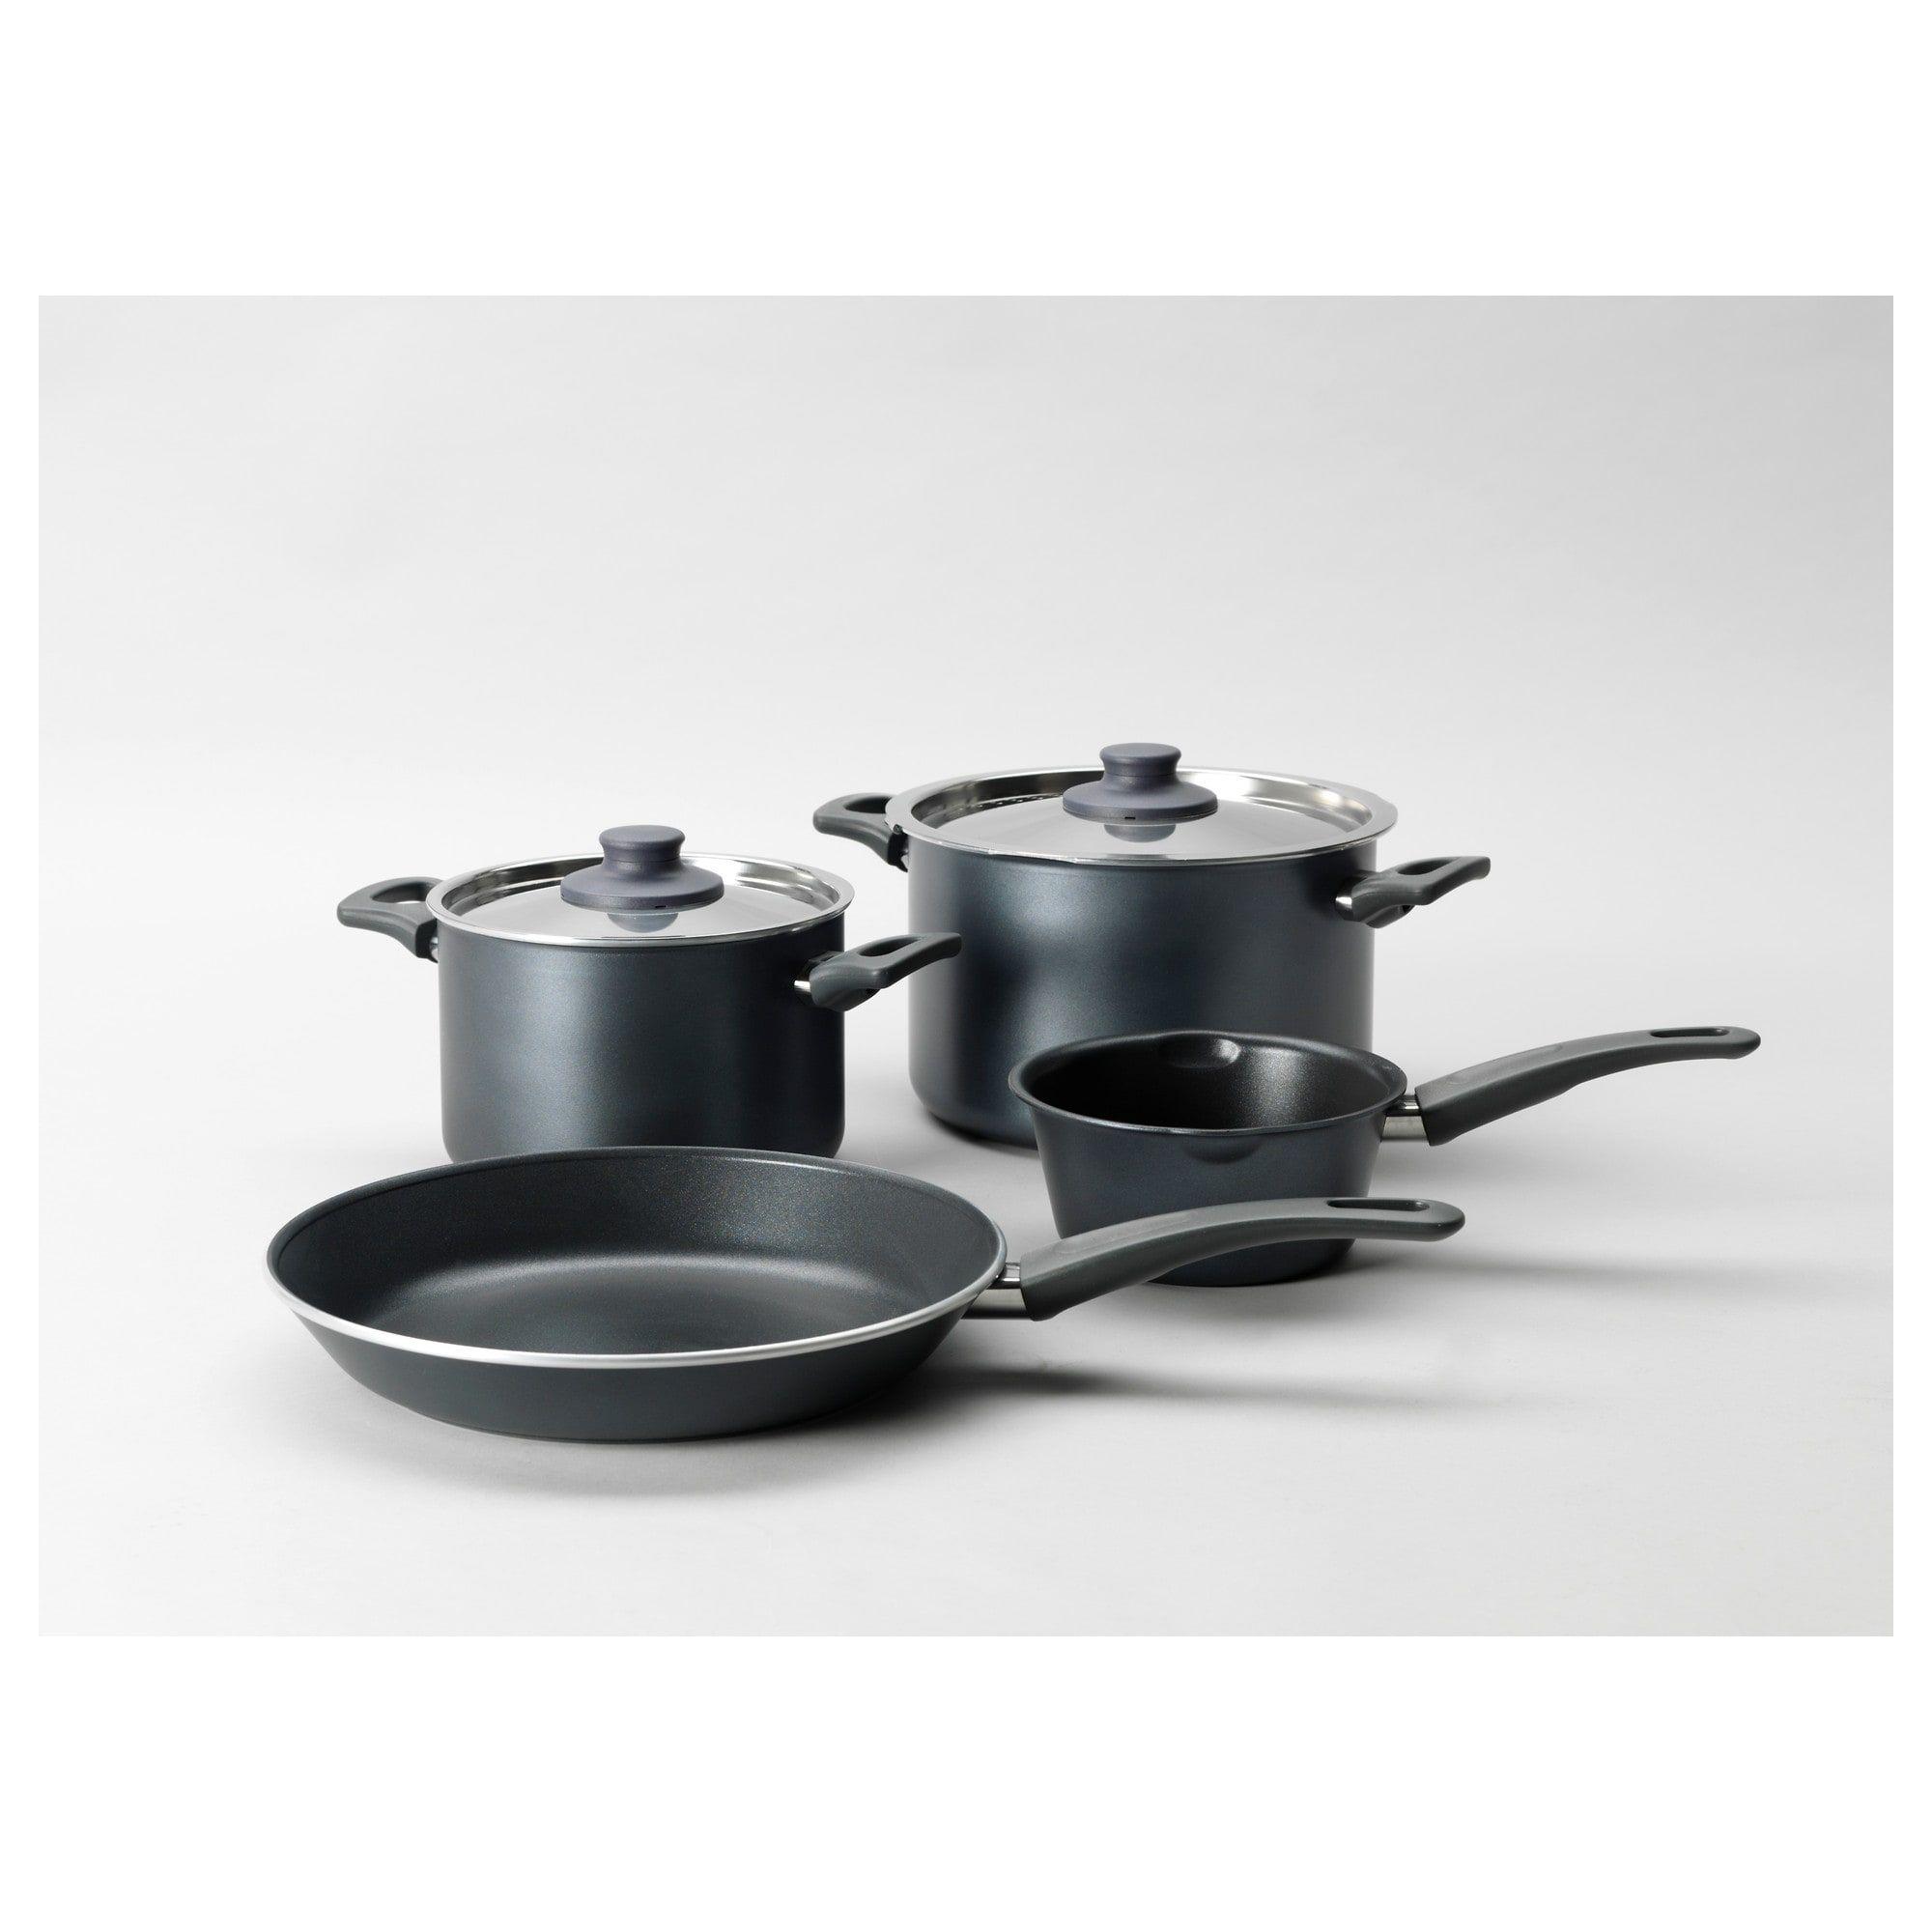 SkÄnka 6 Piece Cookware Set Gray Products In 2019